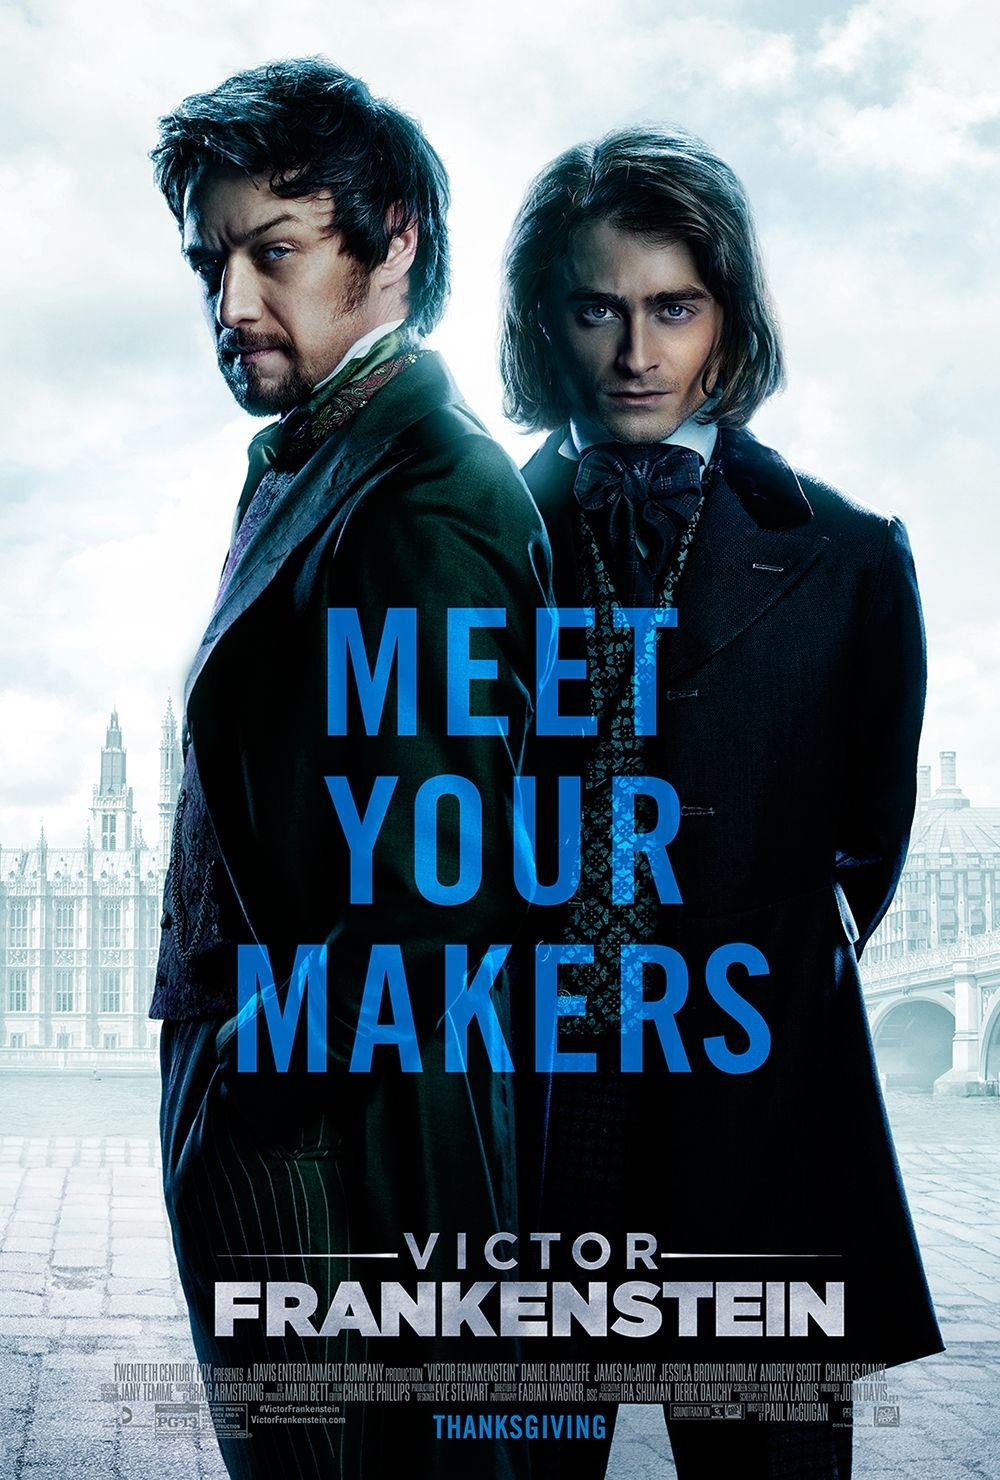 Victorfrankenstein Starring James Mcavoy Daniel Radcliffe In Theaters November 25 2015 Victor Frankenstein Frankenstein Film Frankenstein